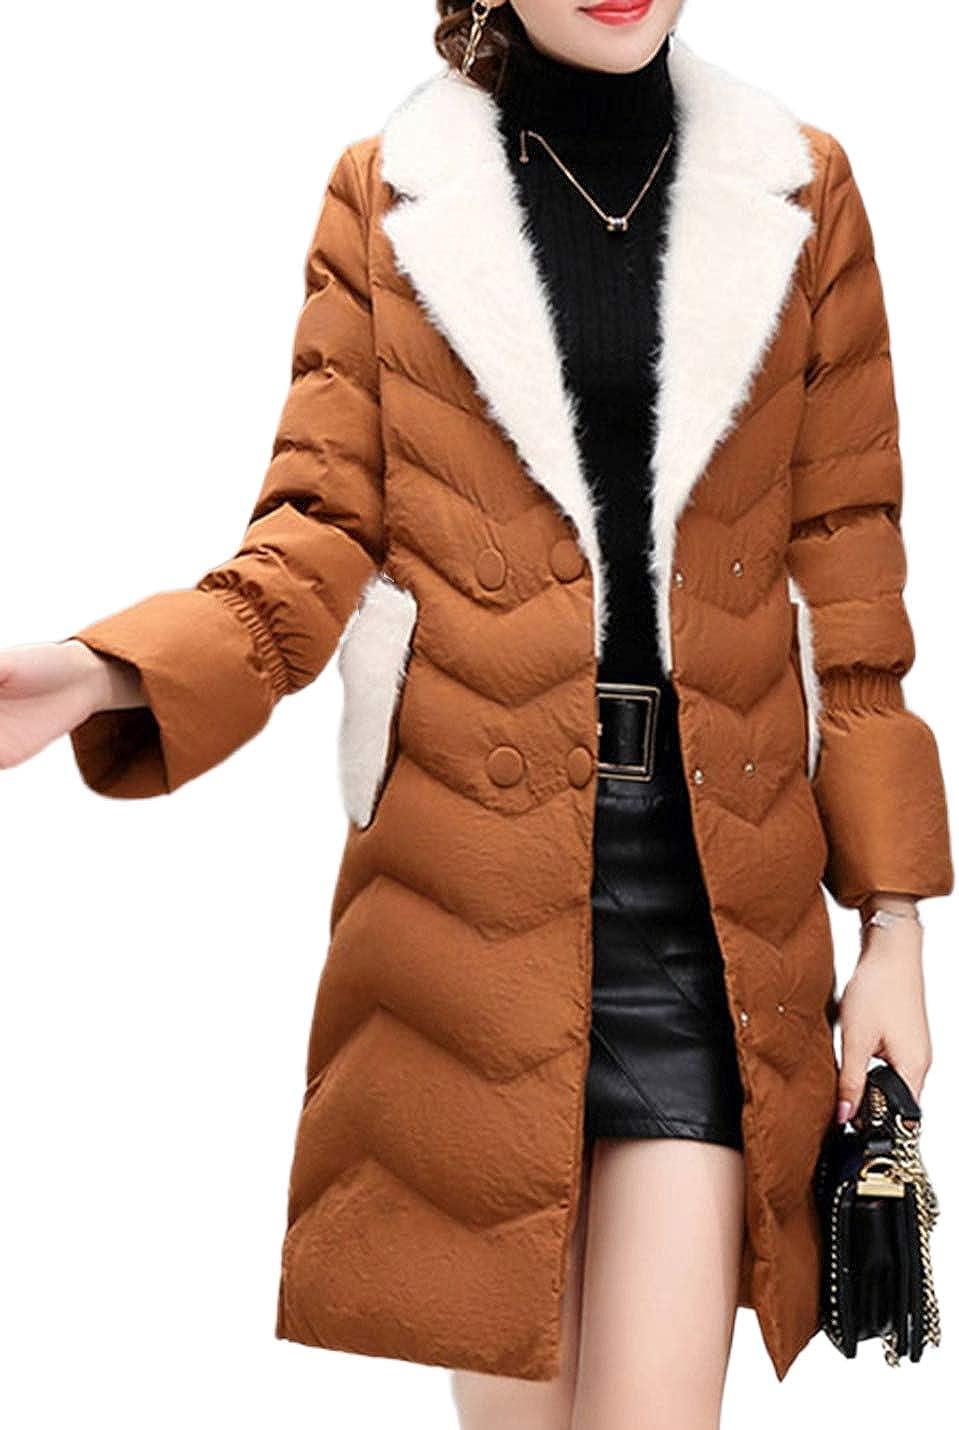 Uaneo Women's Mid Long Slim Fur Lapel Collar Quilted Puffey Jacket Winter Coat(Camel-M)